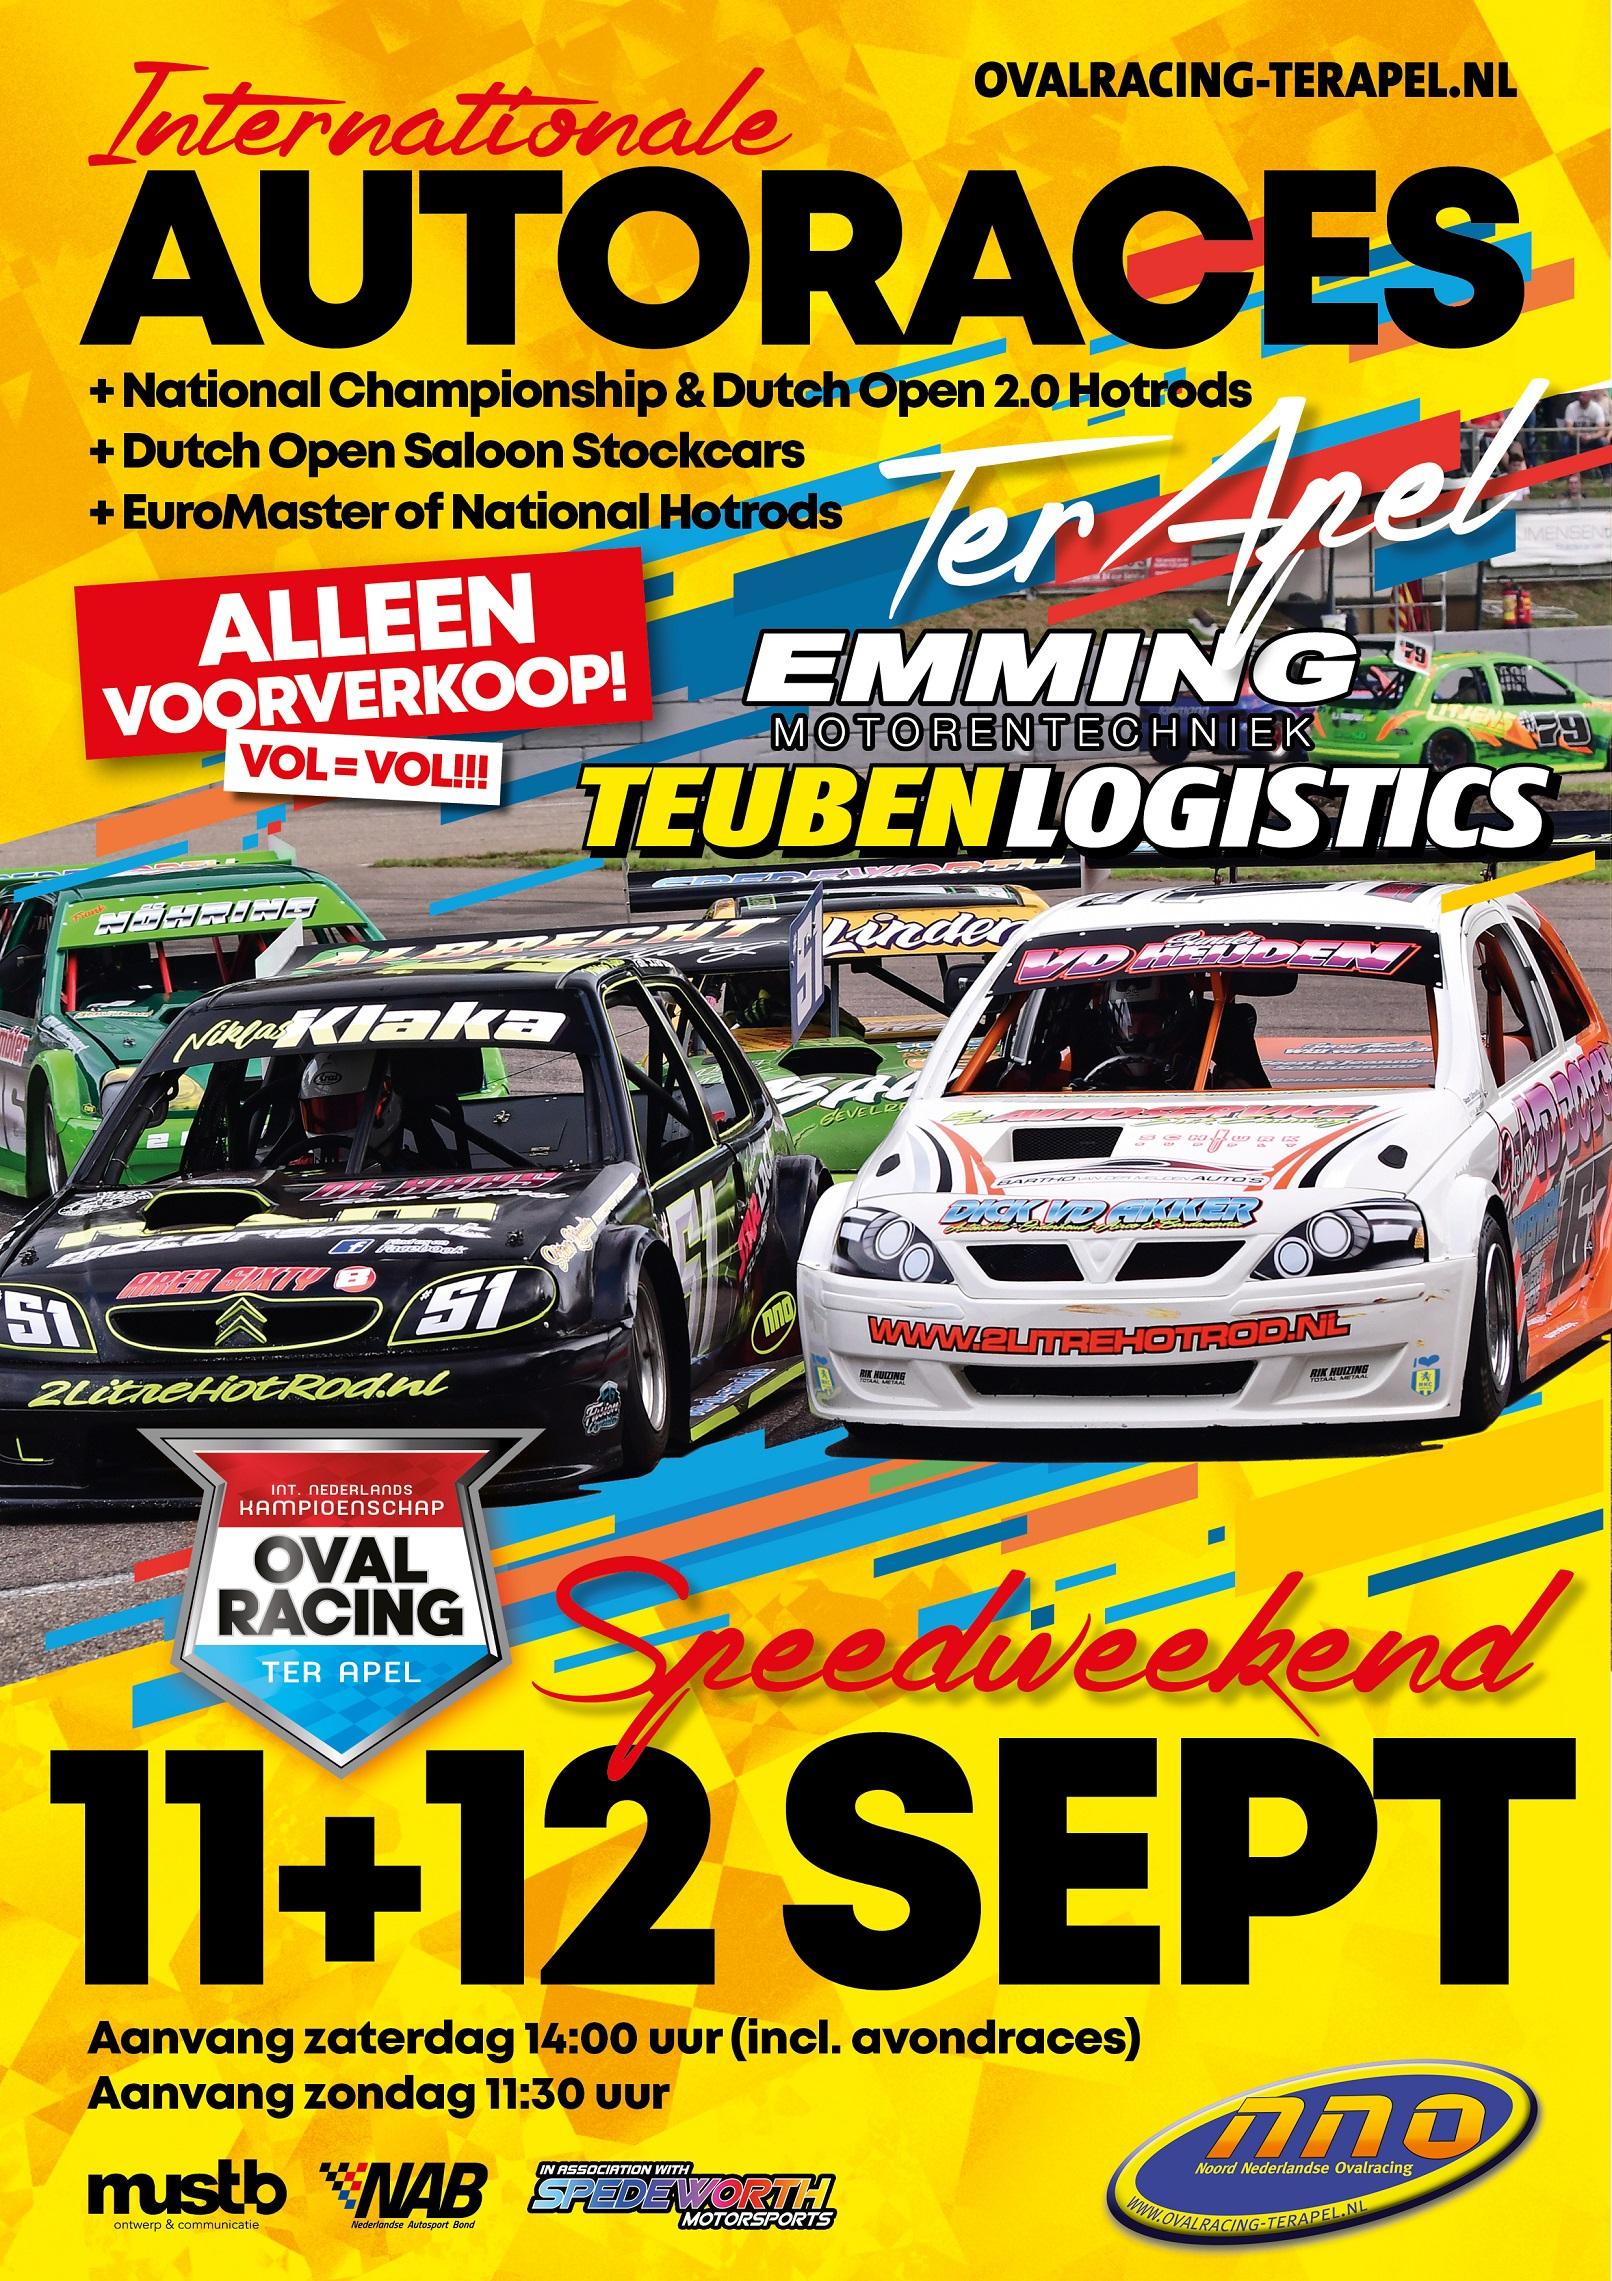 Internationale Ovalraces Publiek 11 & 12 september 2021